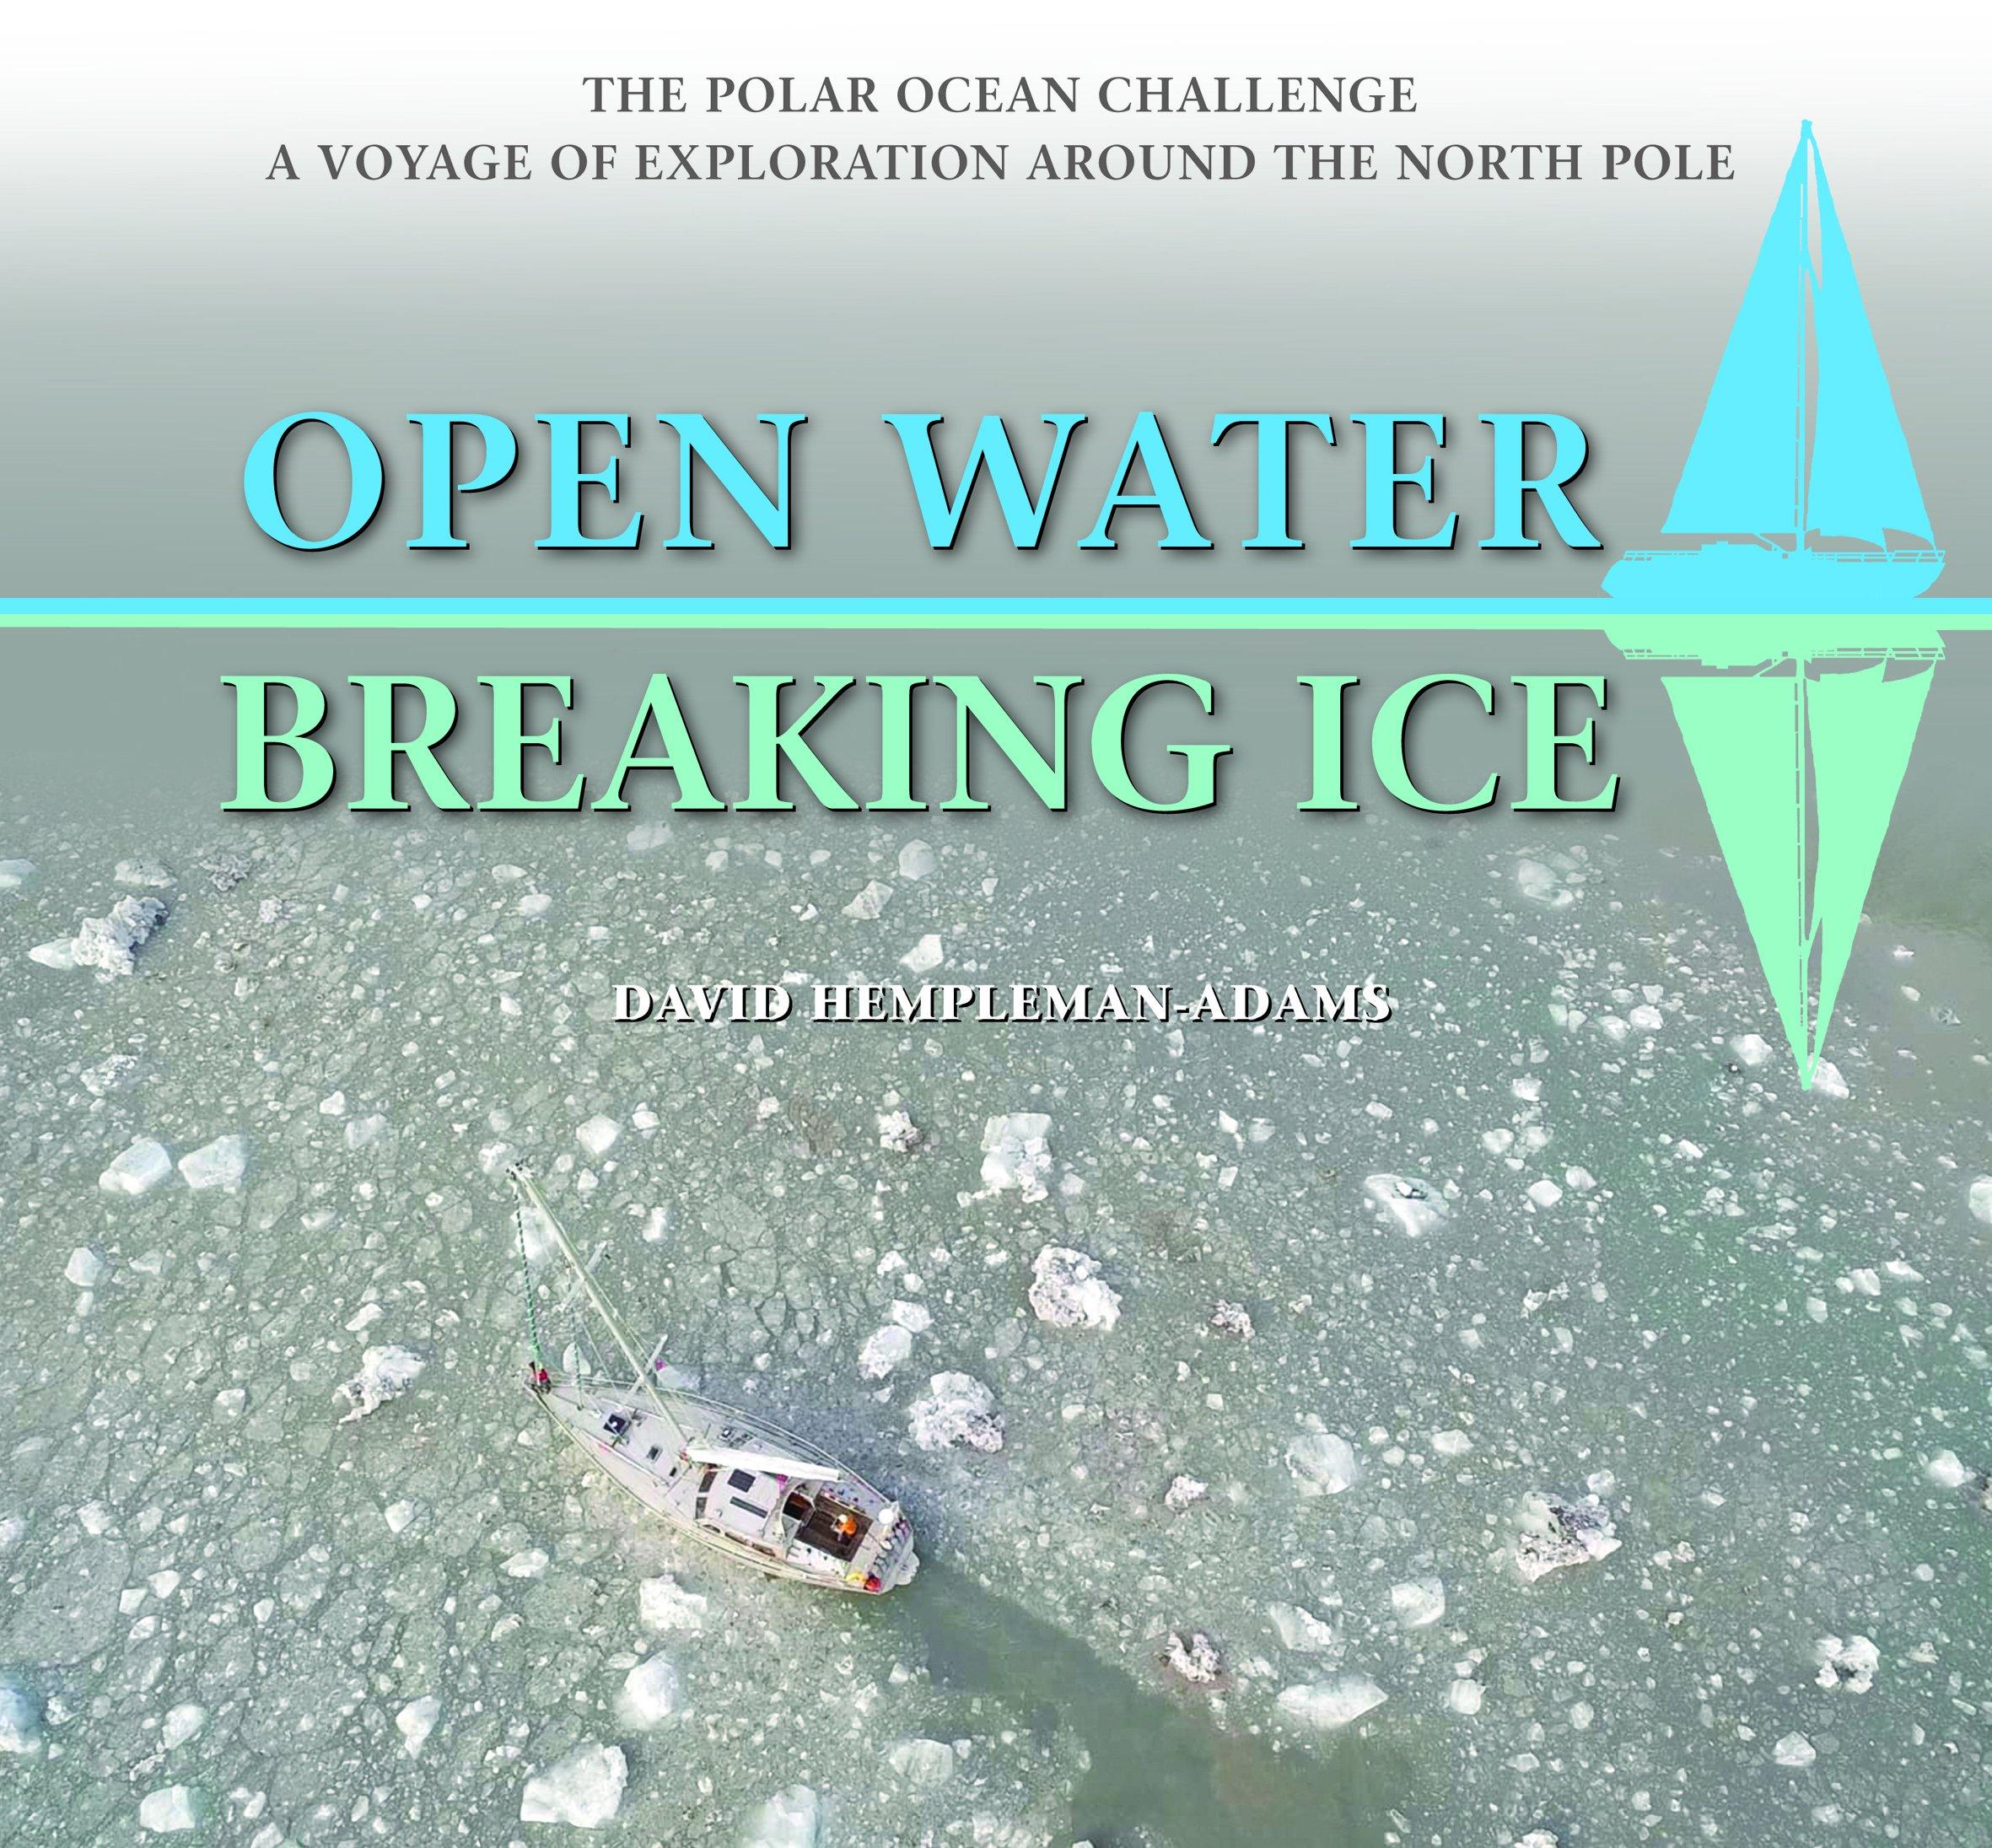 Open Water-Breaking Ice: The Polar Ocean Challenge  A Voyage